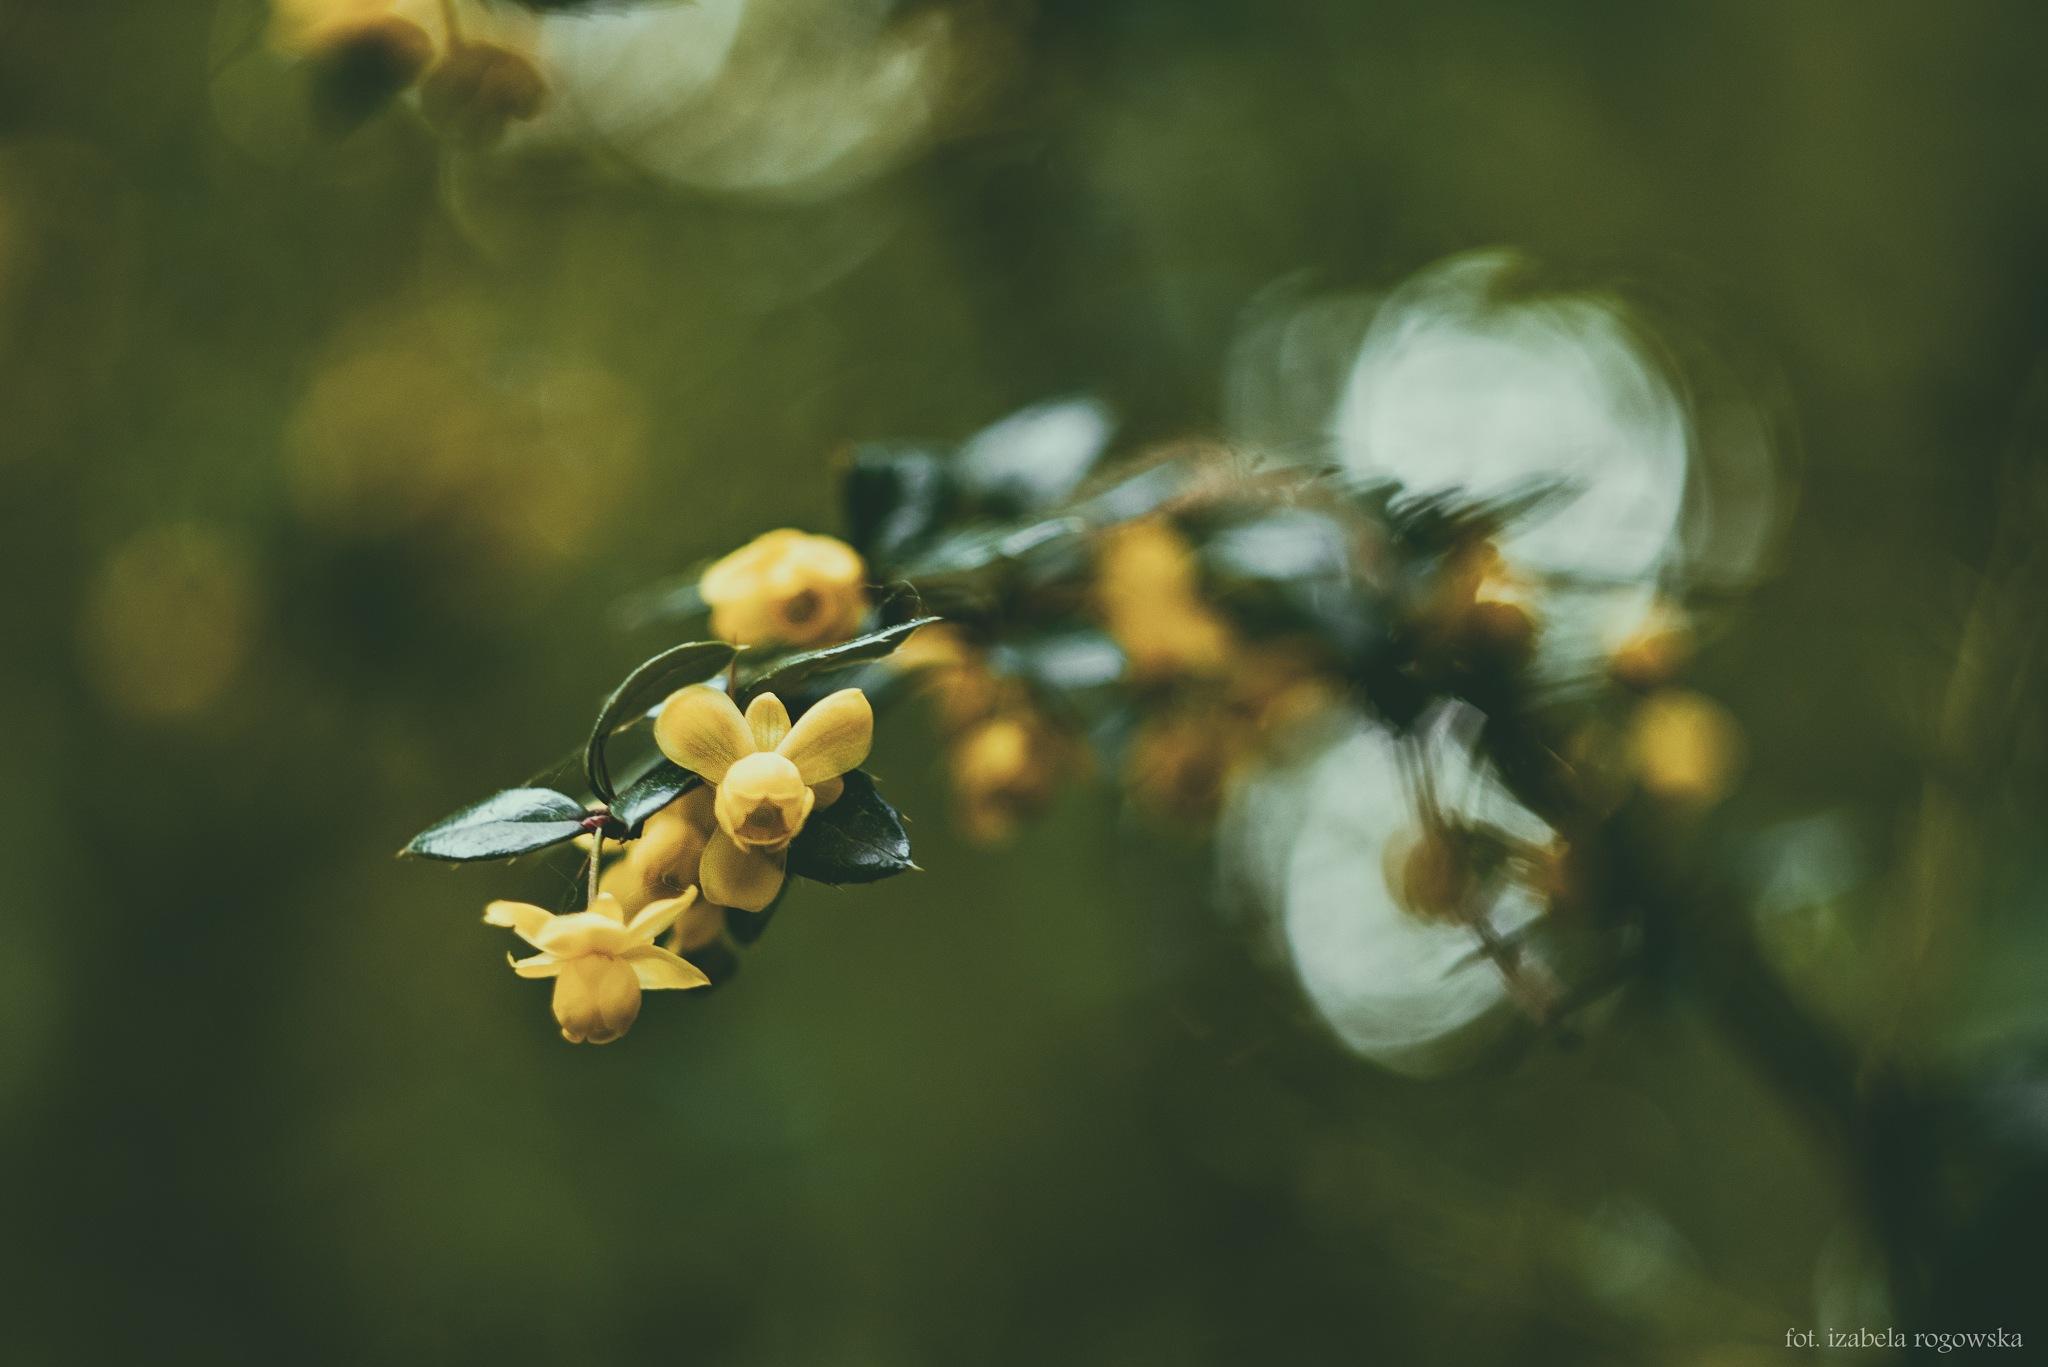 Spring-flowers by Izabela Rogowska